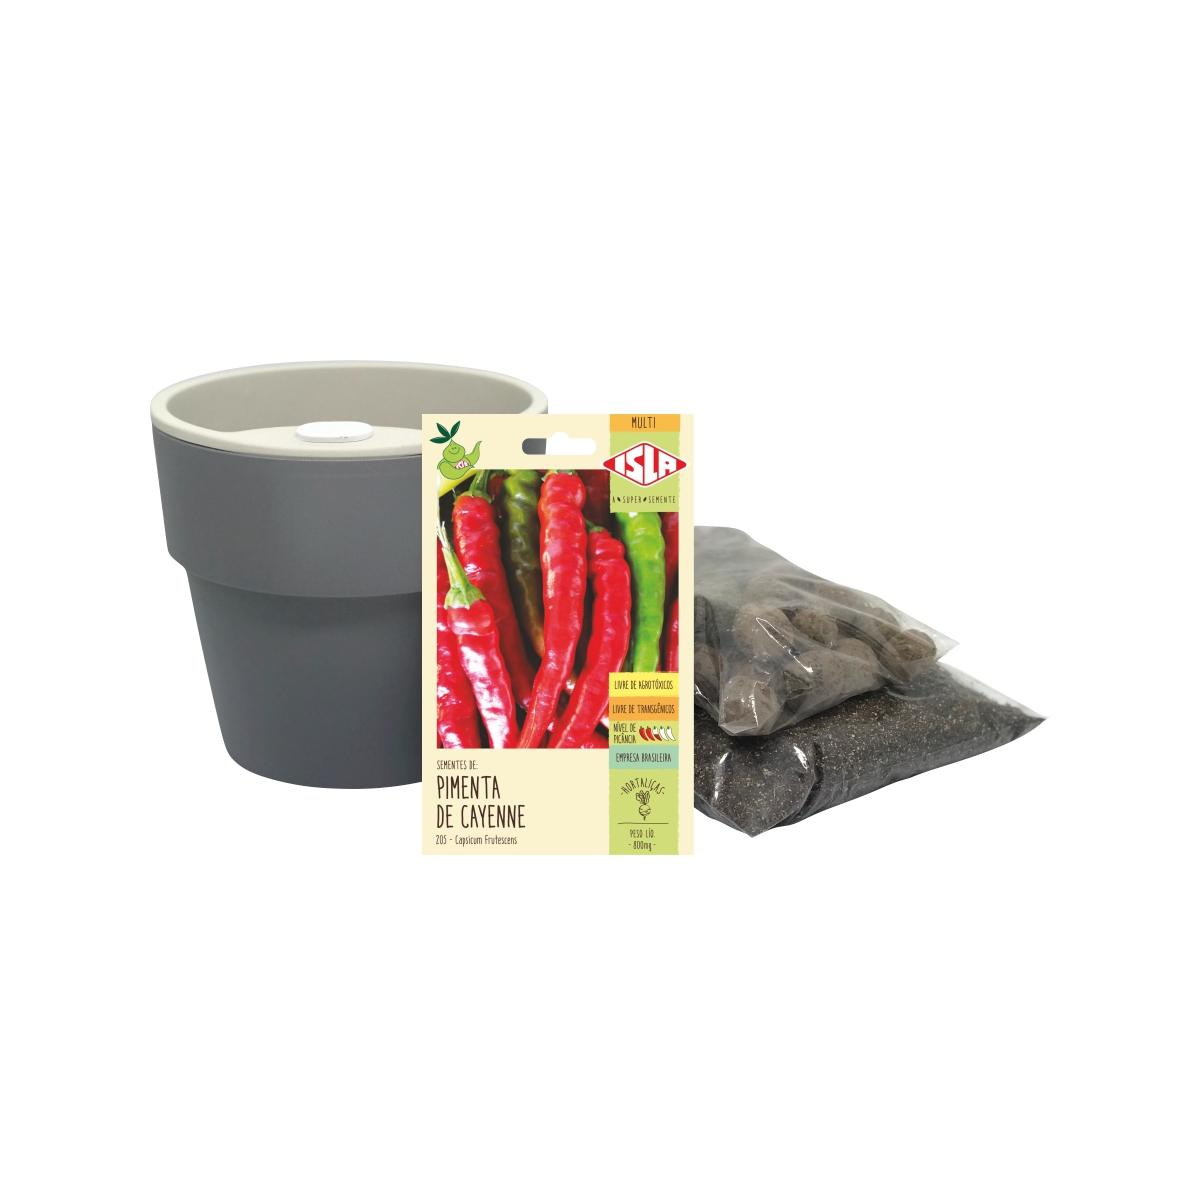 Kit completo Meu Primeiro Plantio de Pimenta Cayenne com Vaso Autoirrigável Chumbo Linha Plantar